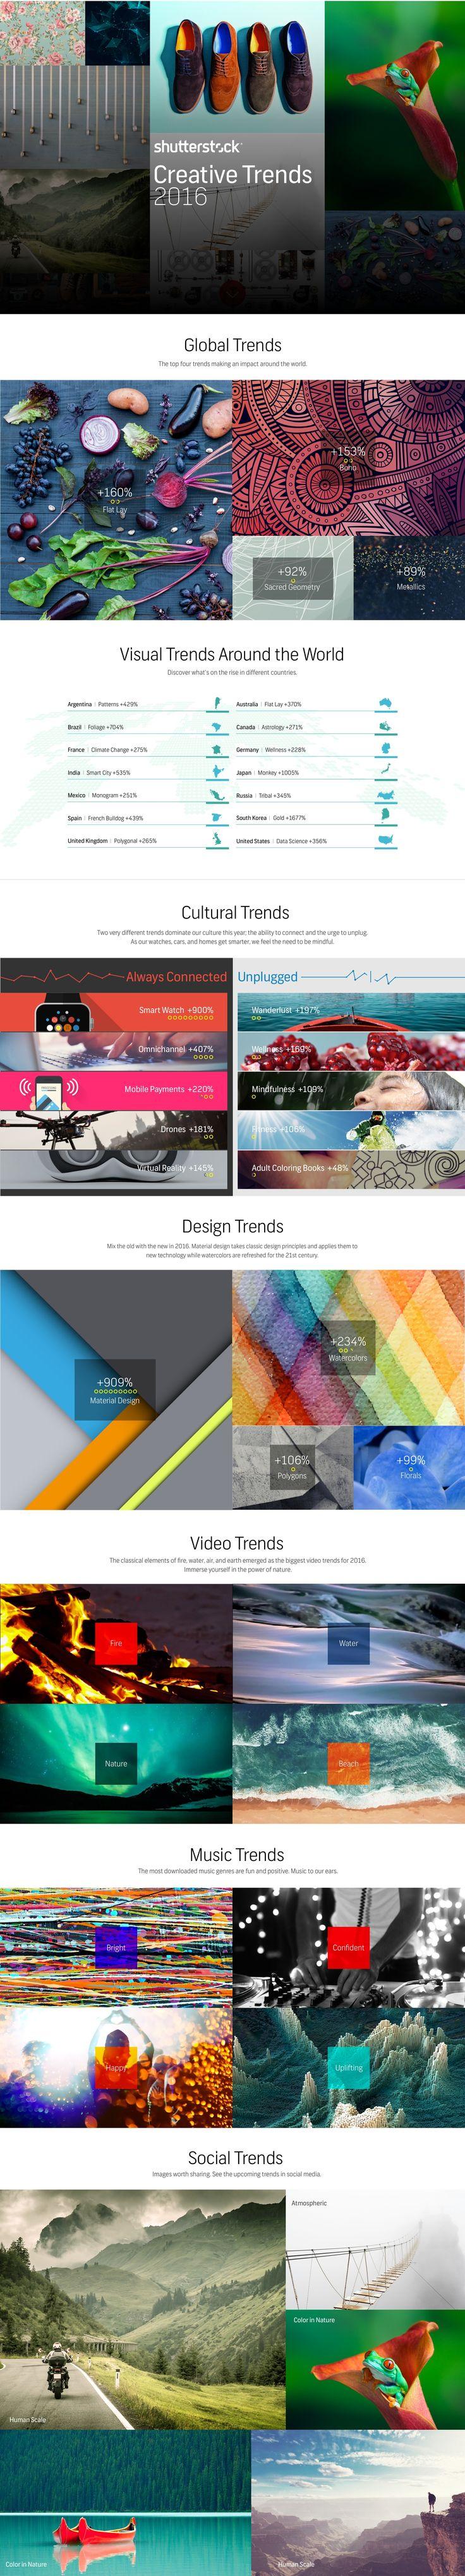 Shutterstock 2016 Trand Infographic